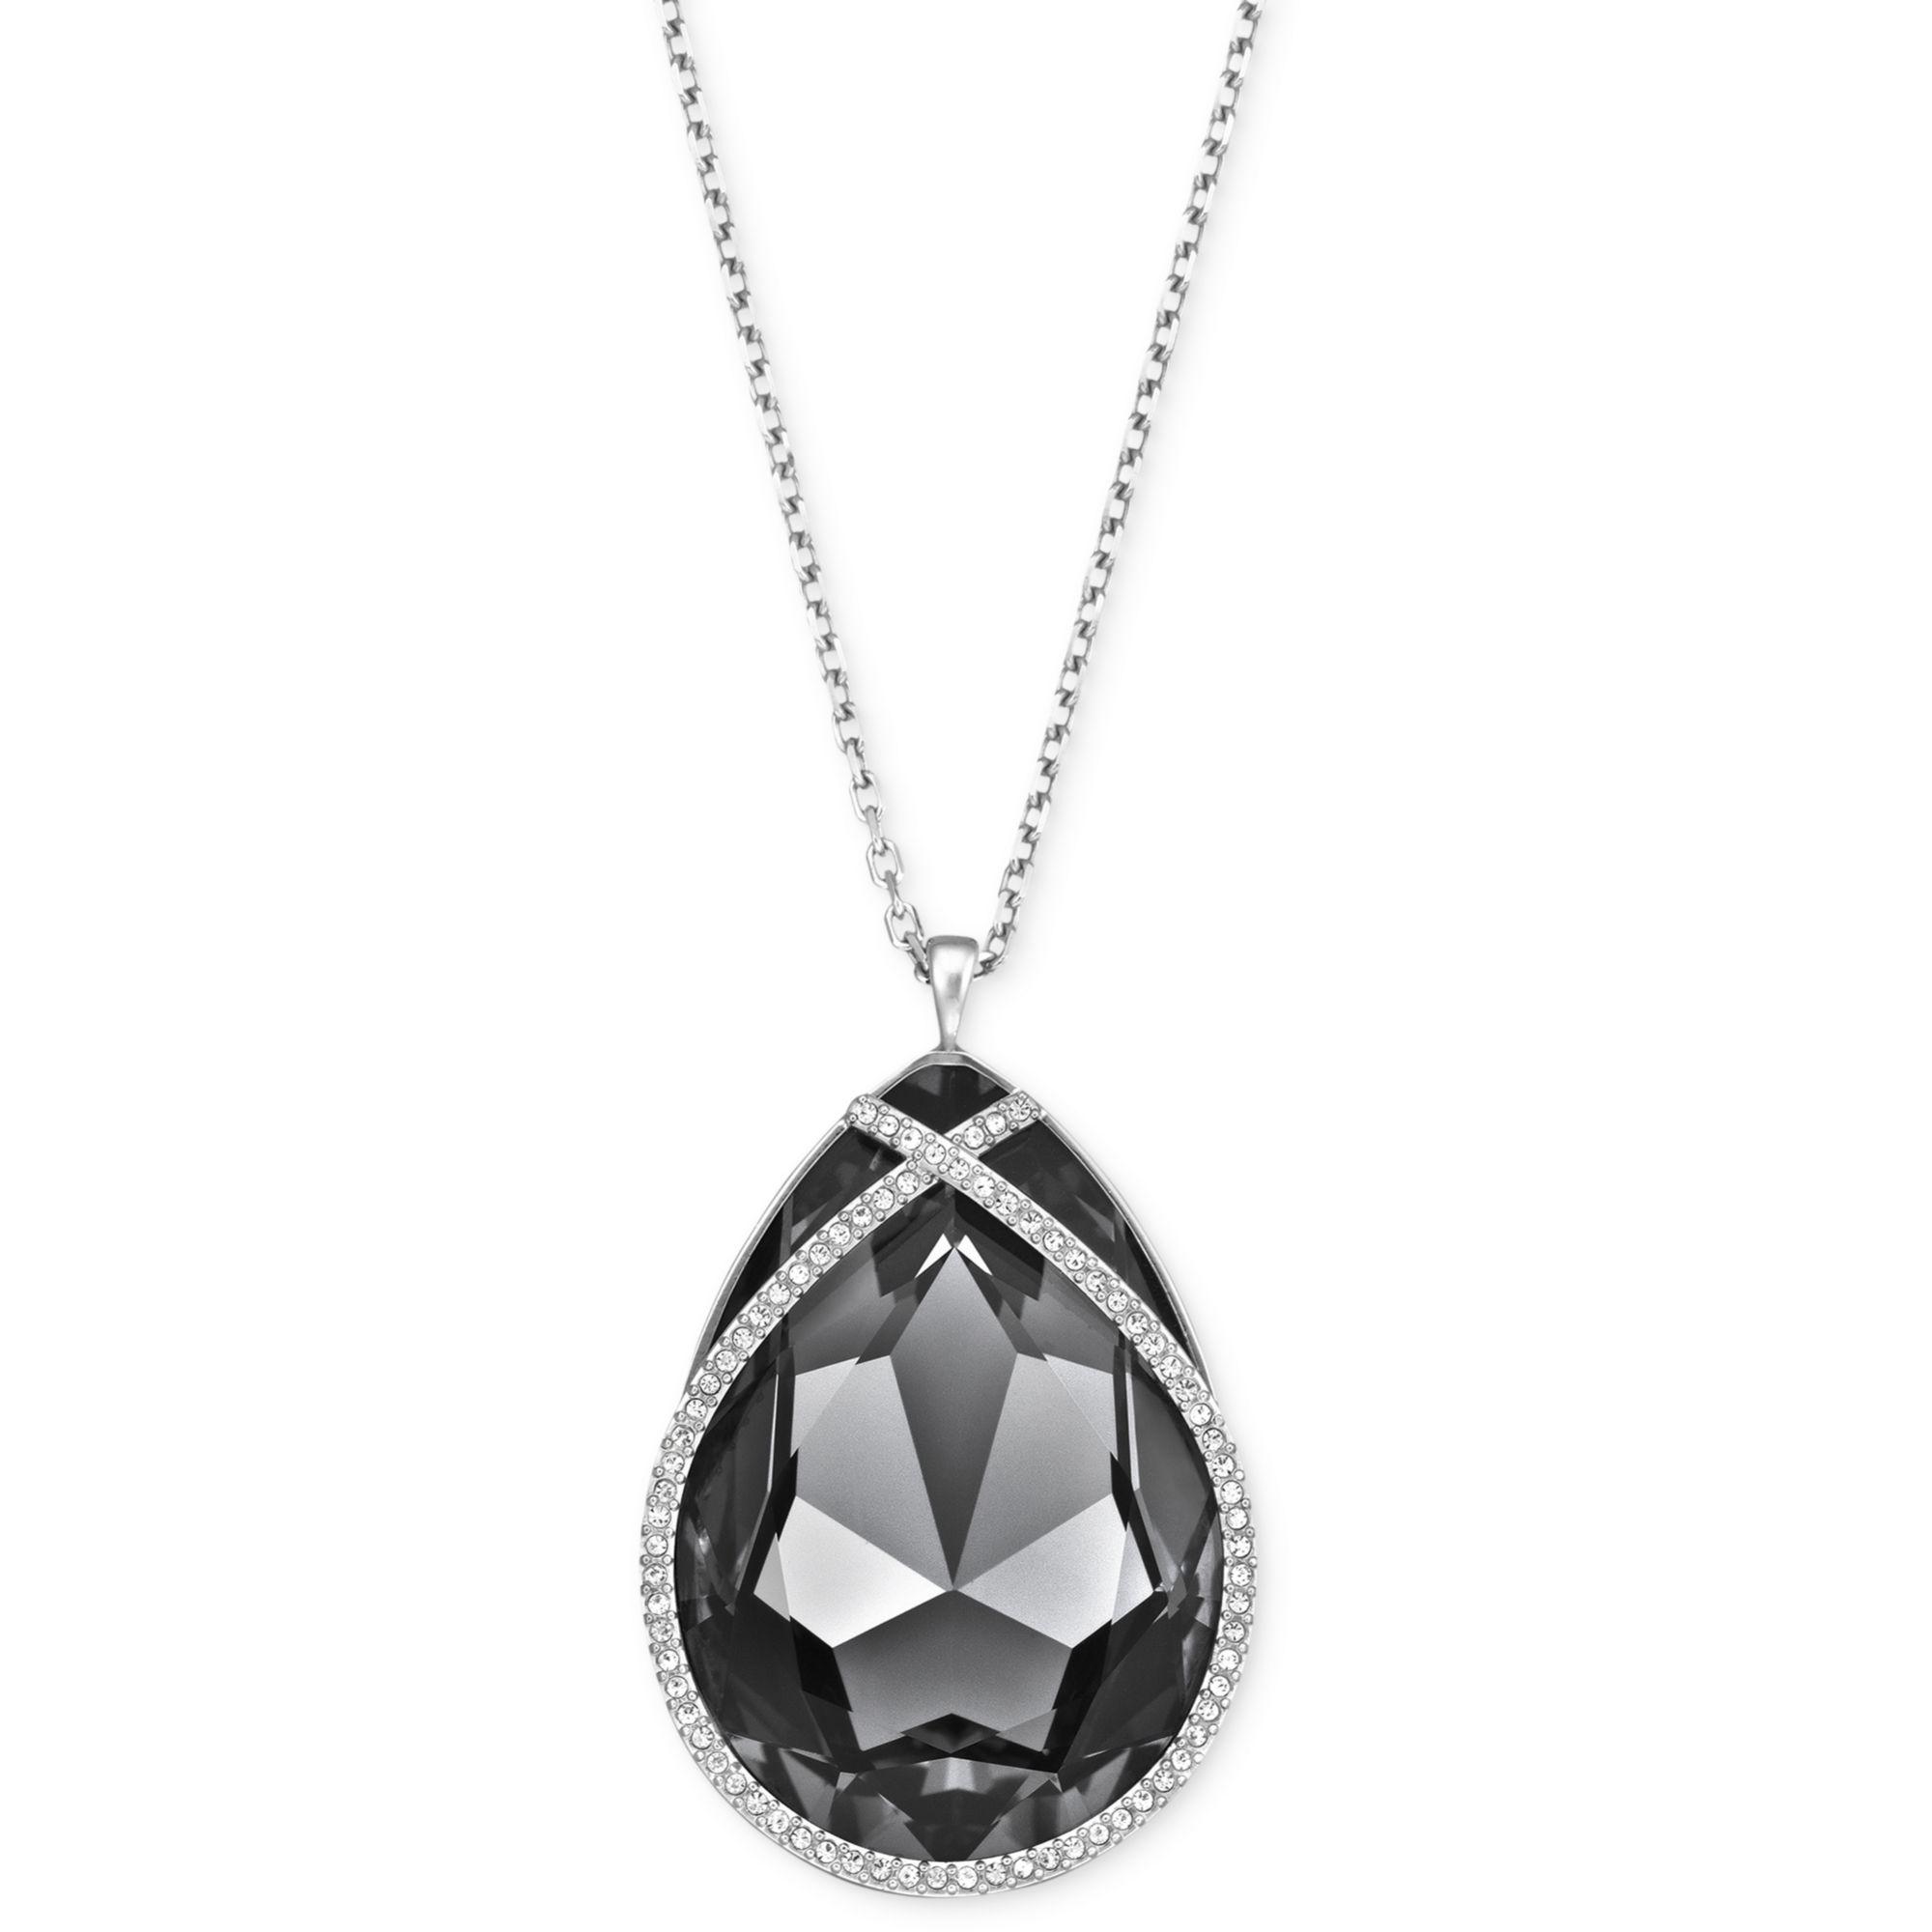 Swarovski Rhodiumplated Black Crystal Teardrop Pendant